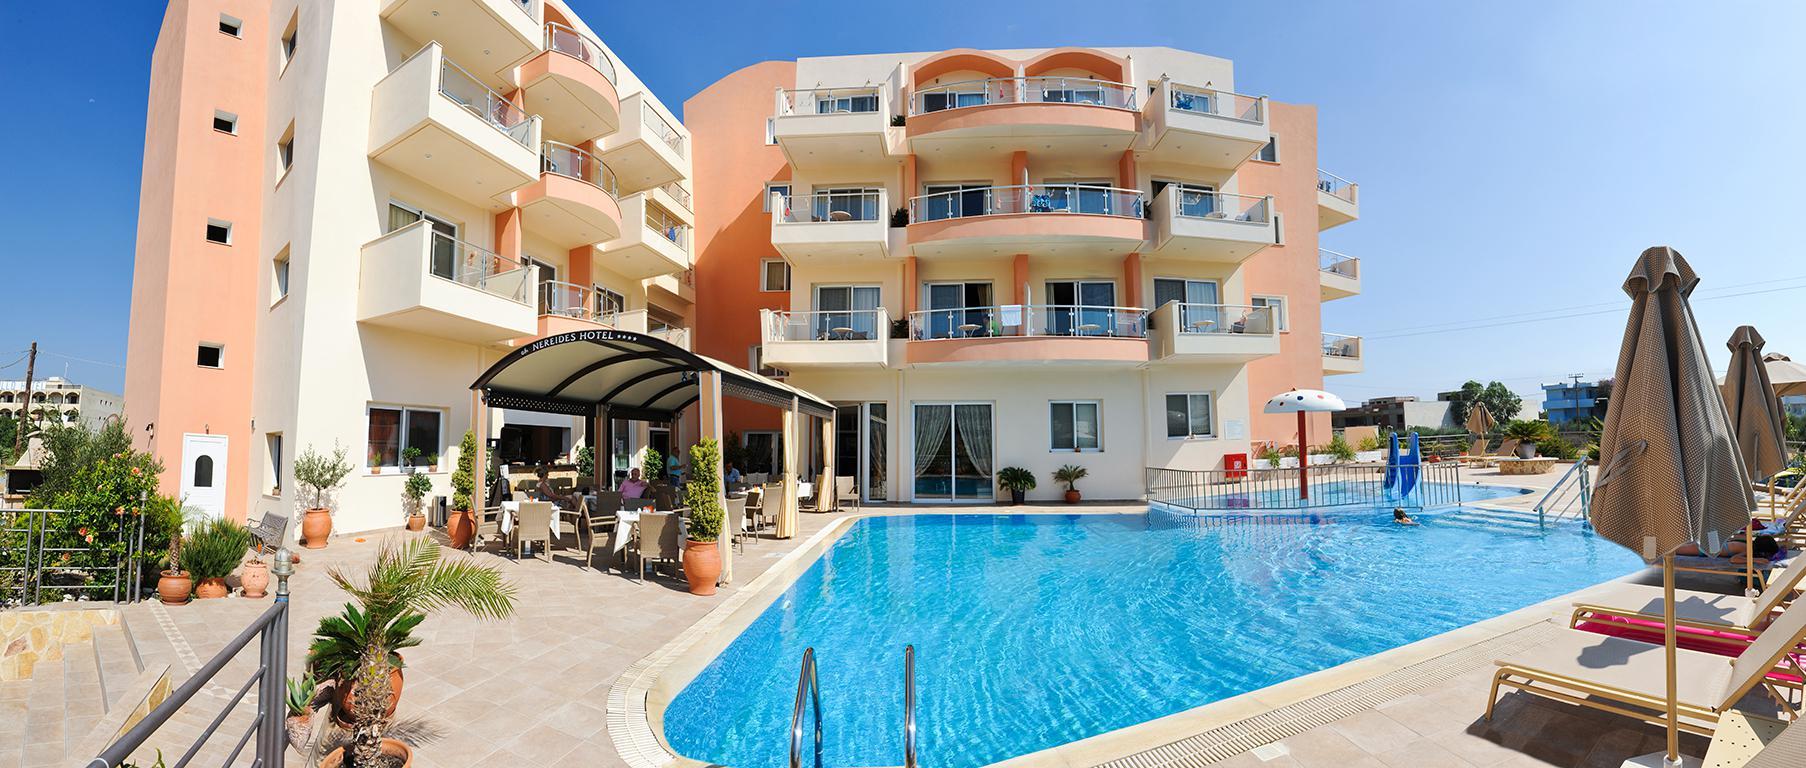 Hotel Nereides